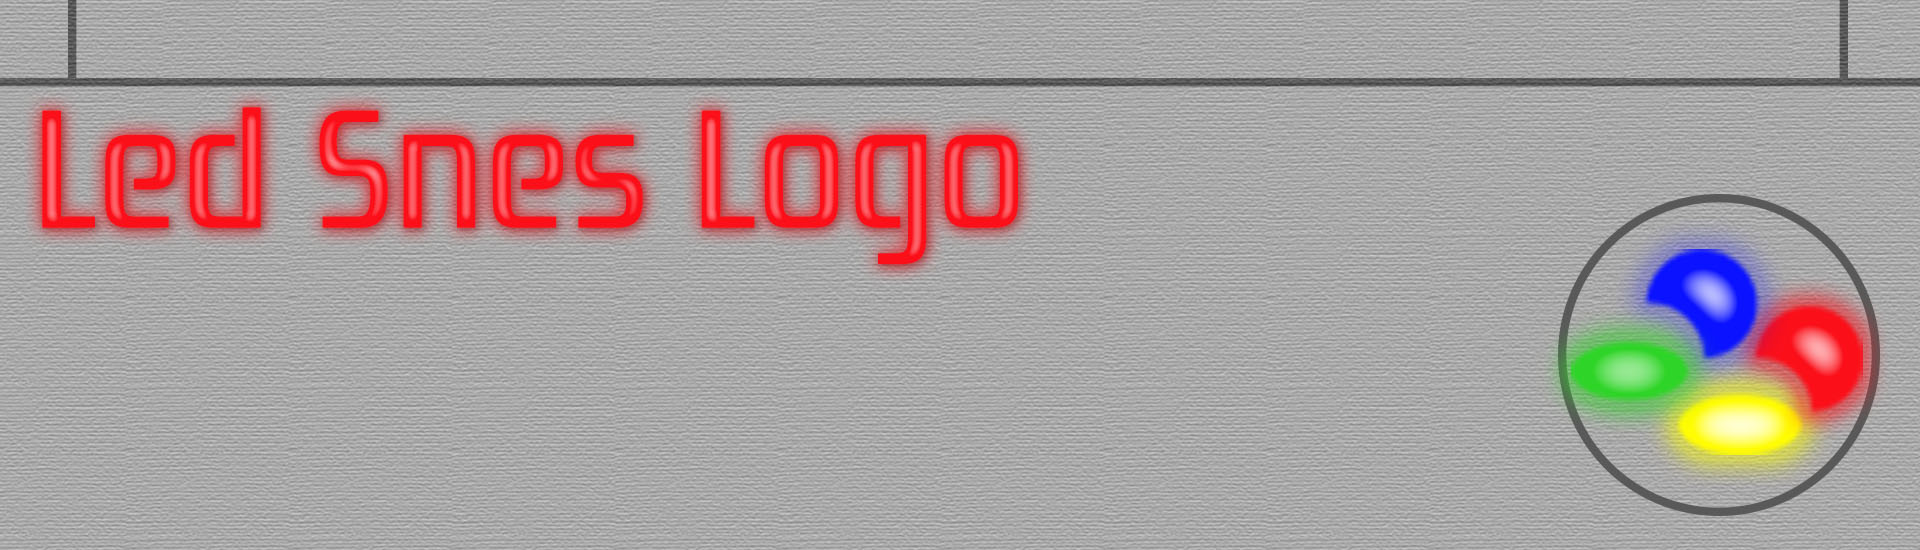 Snes led mod logo